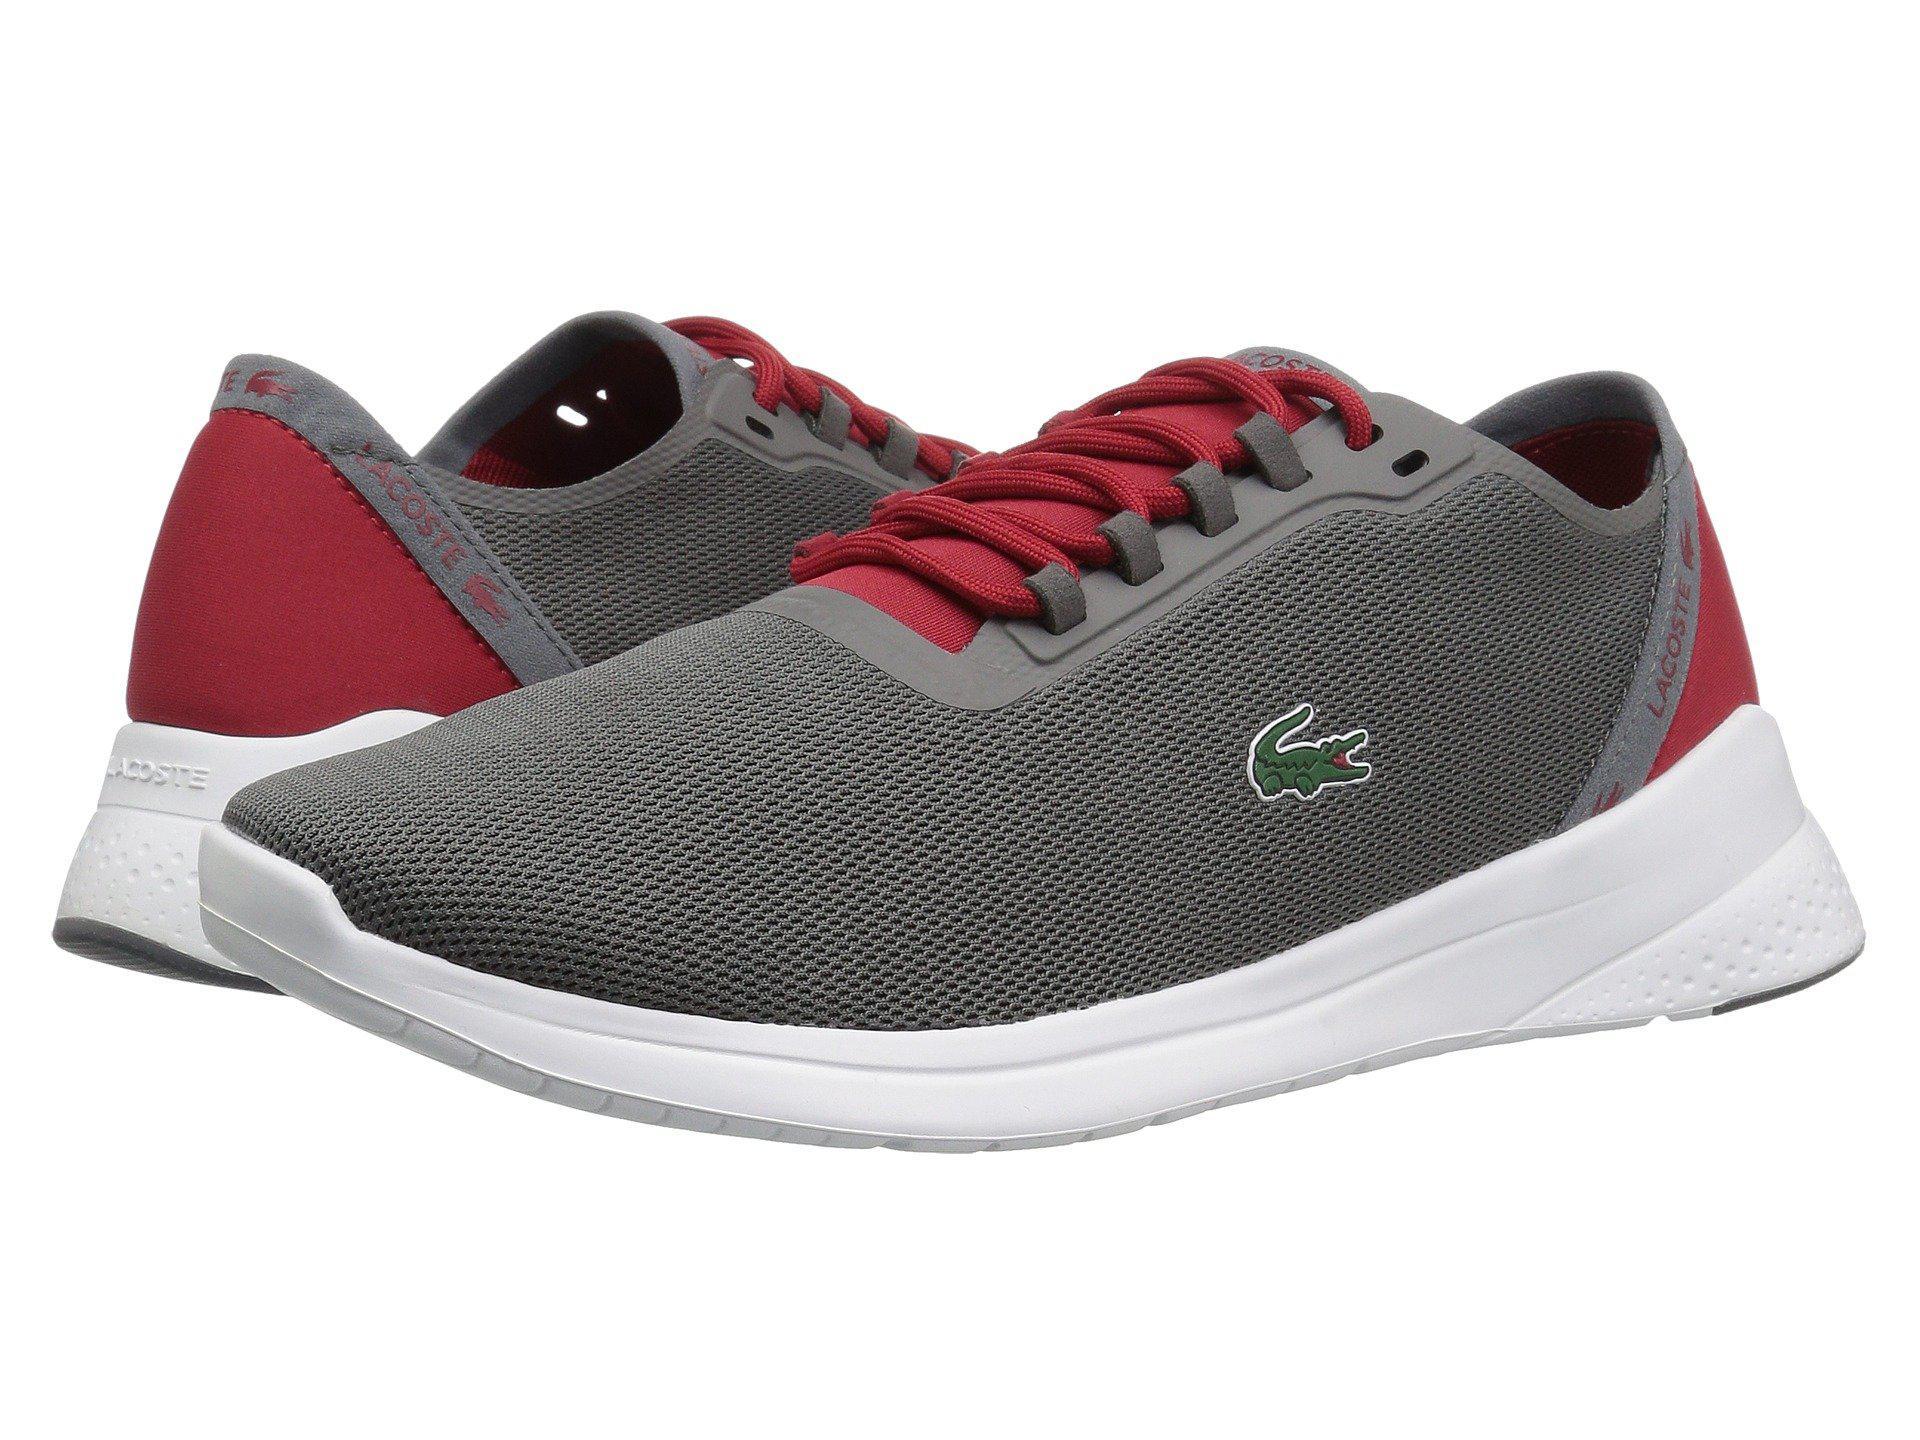 d4ef46990 Lyst - Lacoste Lt Fit 118 4 (black dark Grey) Men s Shoes in Gray ...